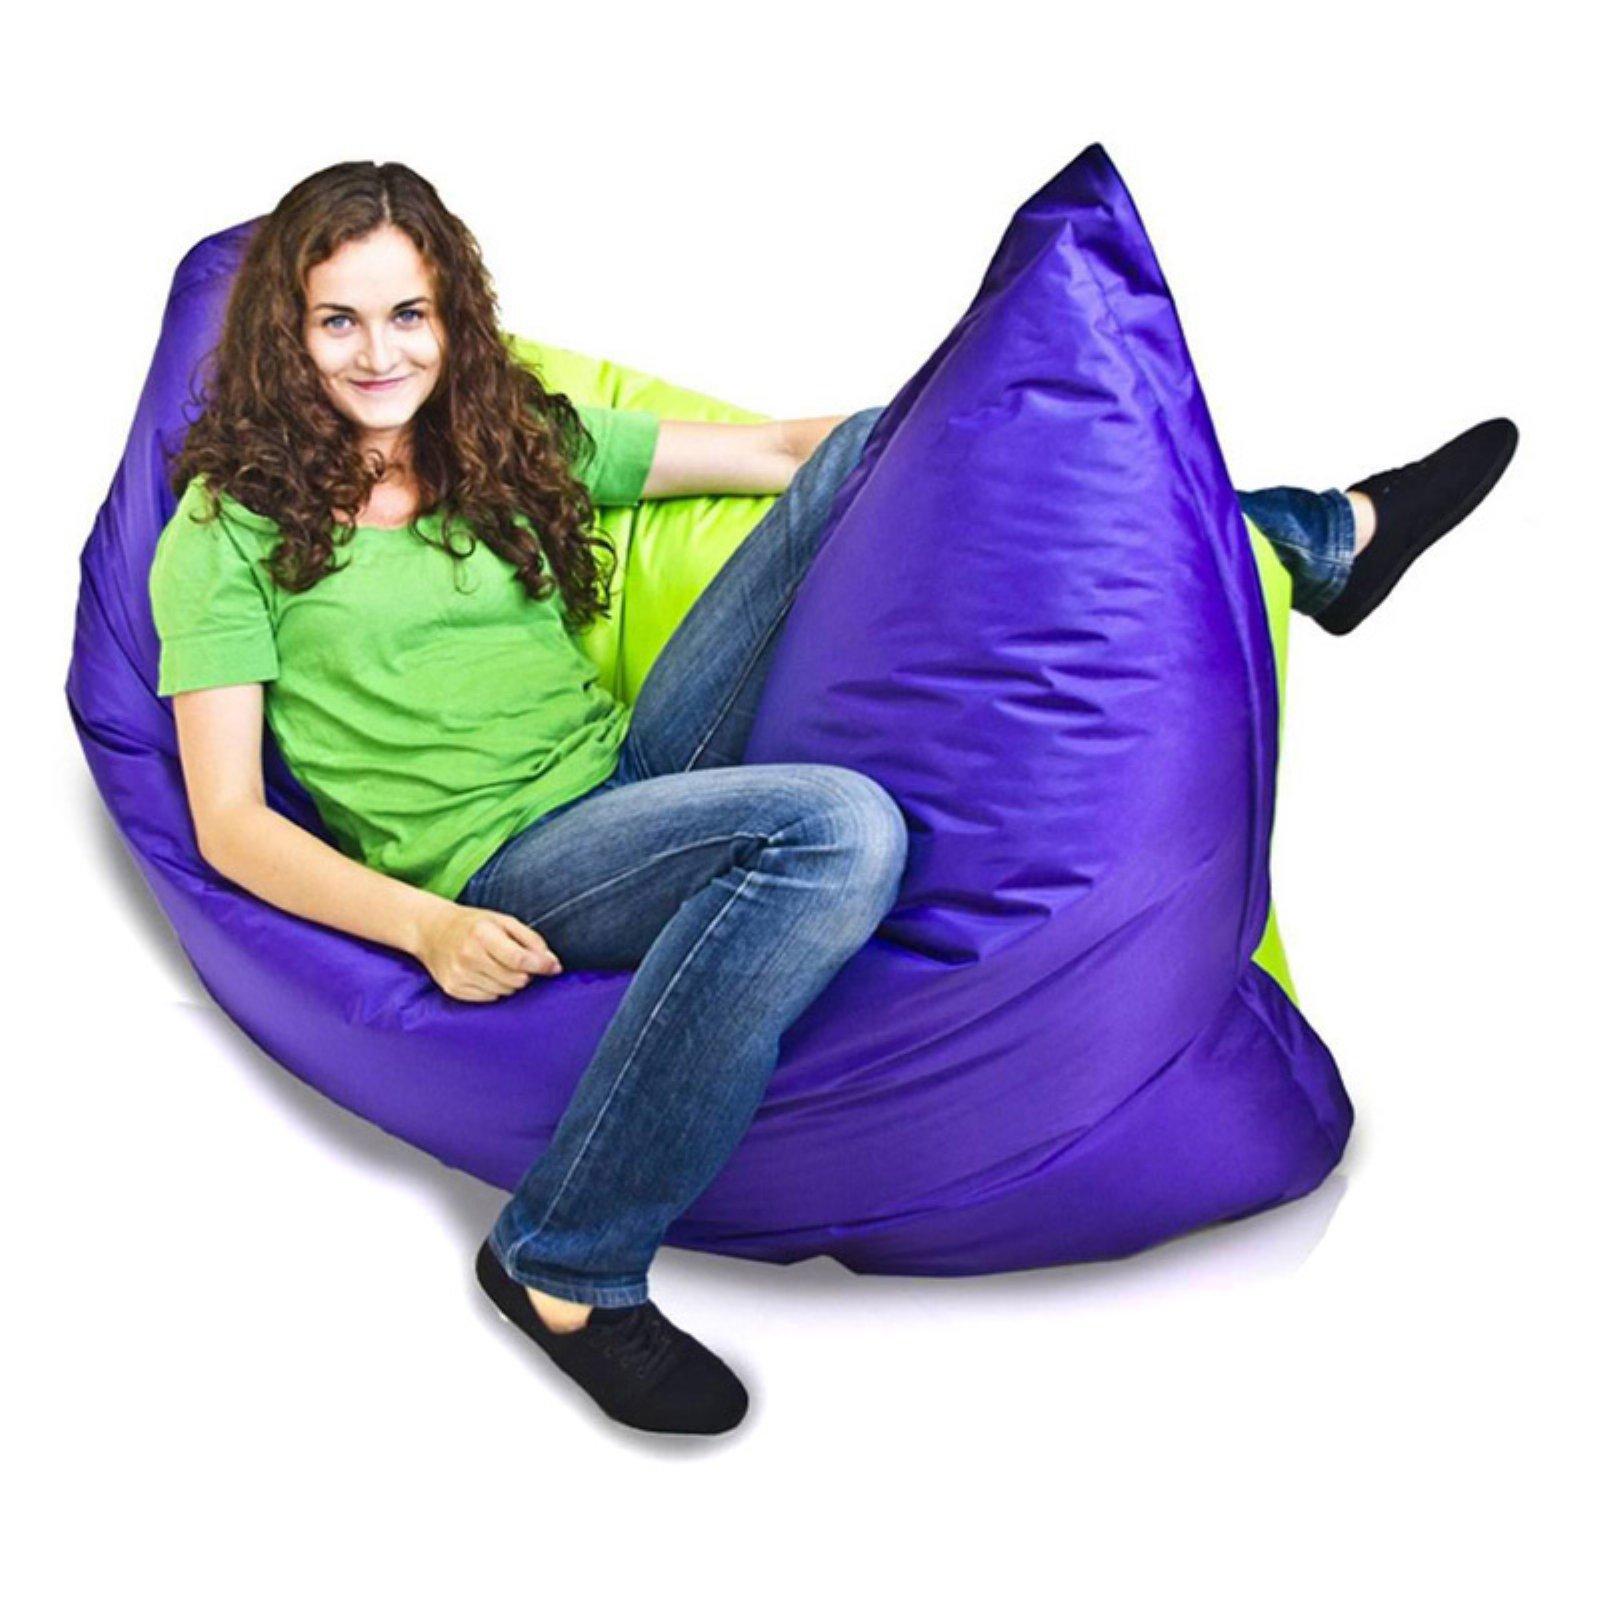 Wondrous Turbo Beanbags Pillow Style Large Bean Bag Chair Violet And Machost Co Dining Chair Design Ideas Machostcouk